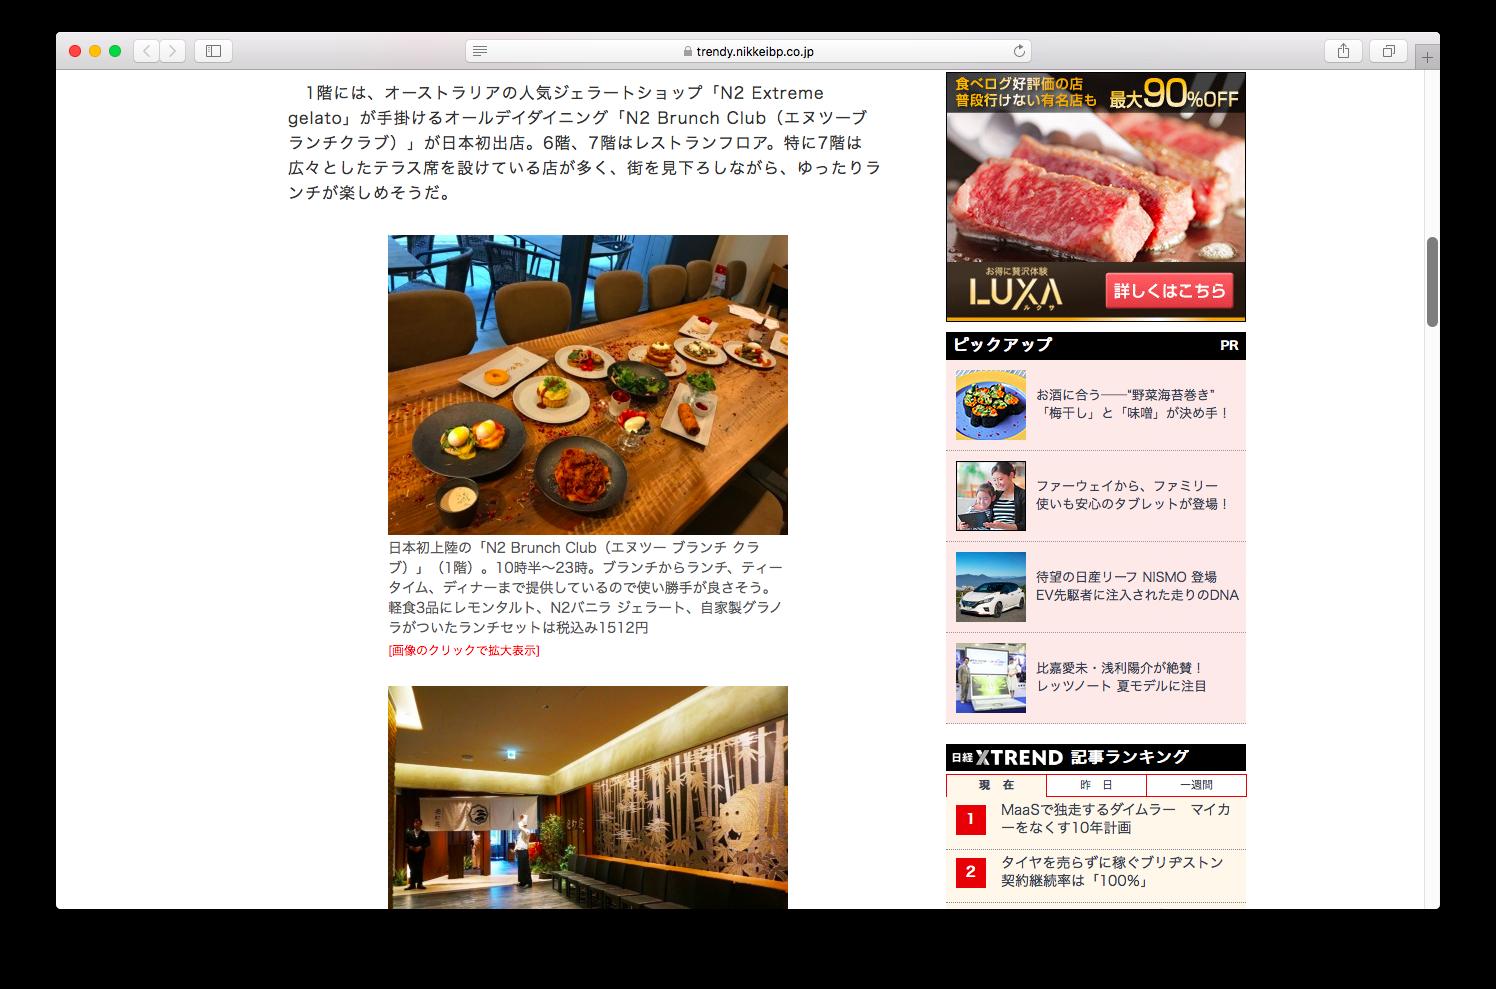 Media Nikkei Trendy.png